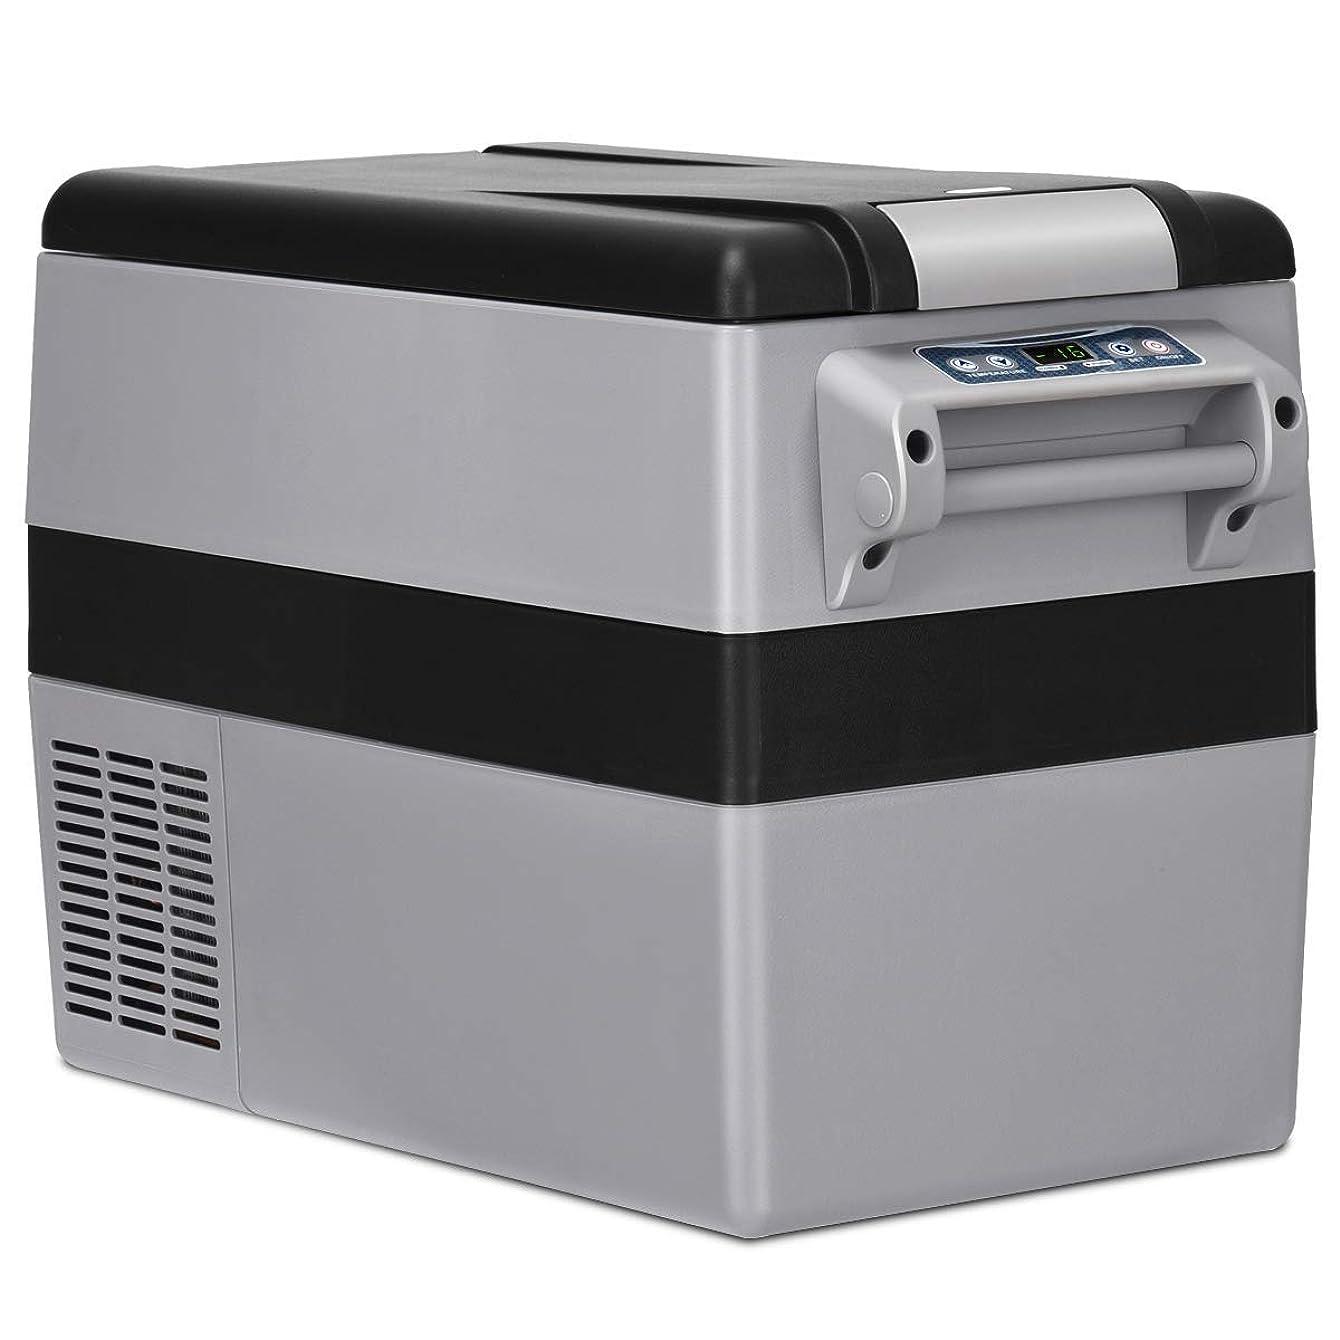 COSTWAY Compressor Refrigerator Freezer, 44 Quart Car Travel Refrigerator Freezer Portable and Compact Vehicle Car Cooler Mini Fridge, -4°F to 50°F For Car and Home, Camping, Truck Party(44 Quart)